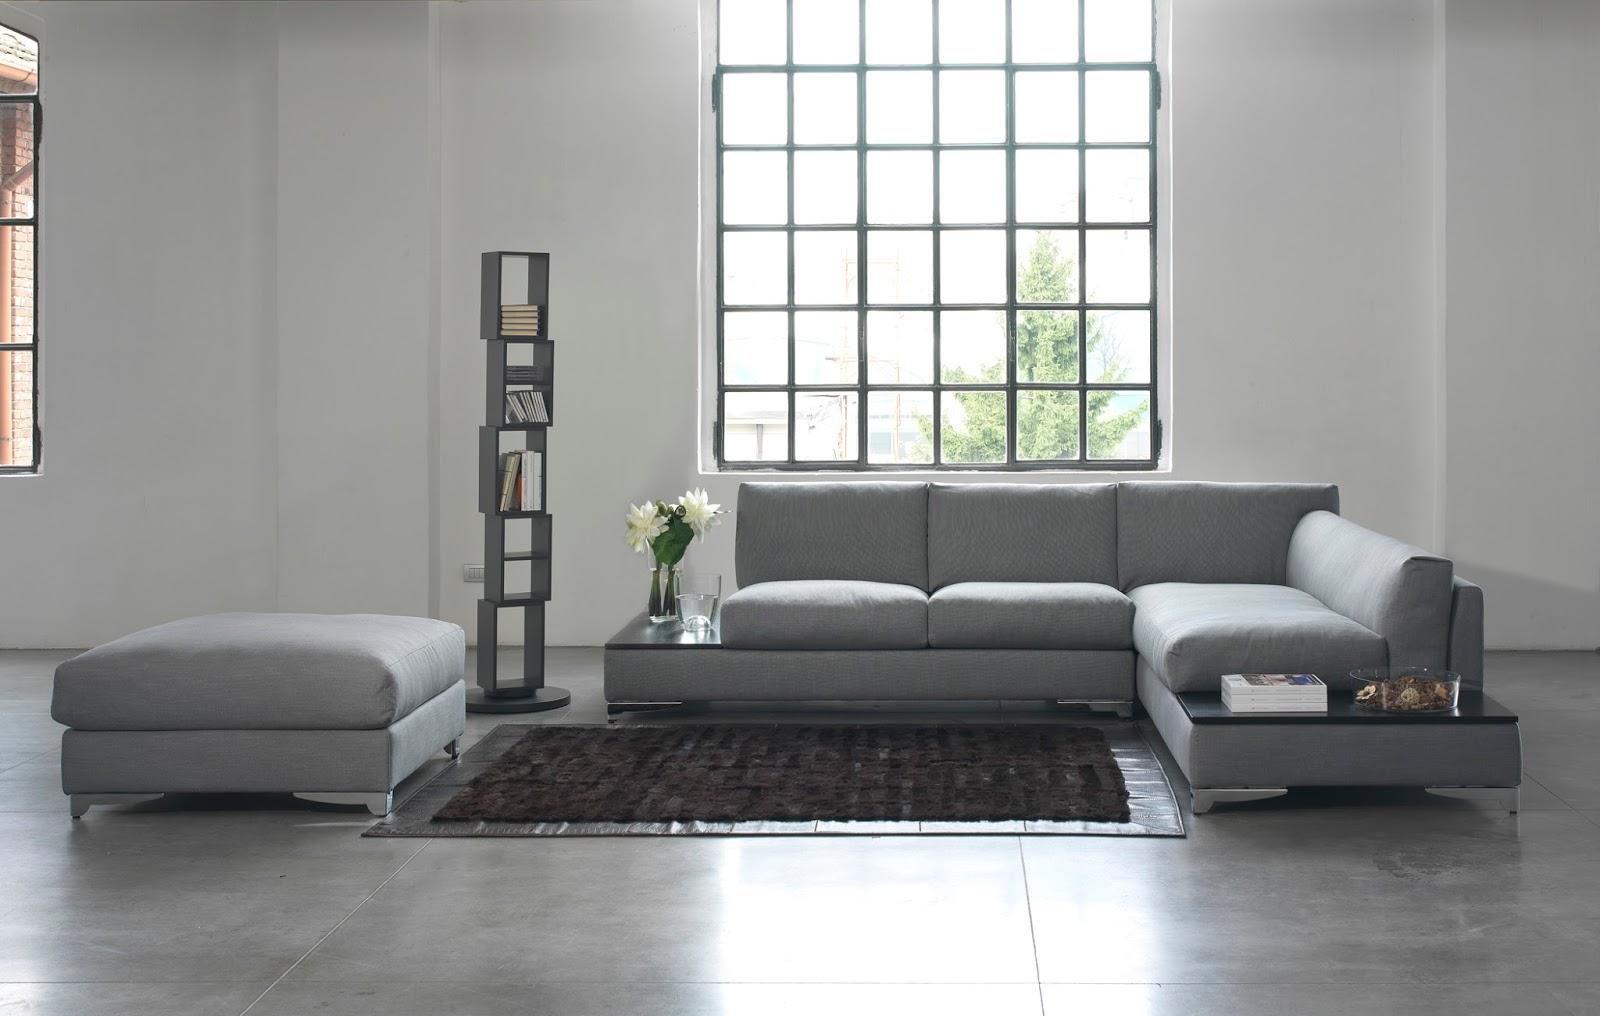 Divani blog tino mariani divano moderno e contemporaneo for Divano moderno